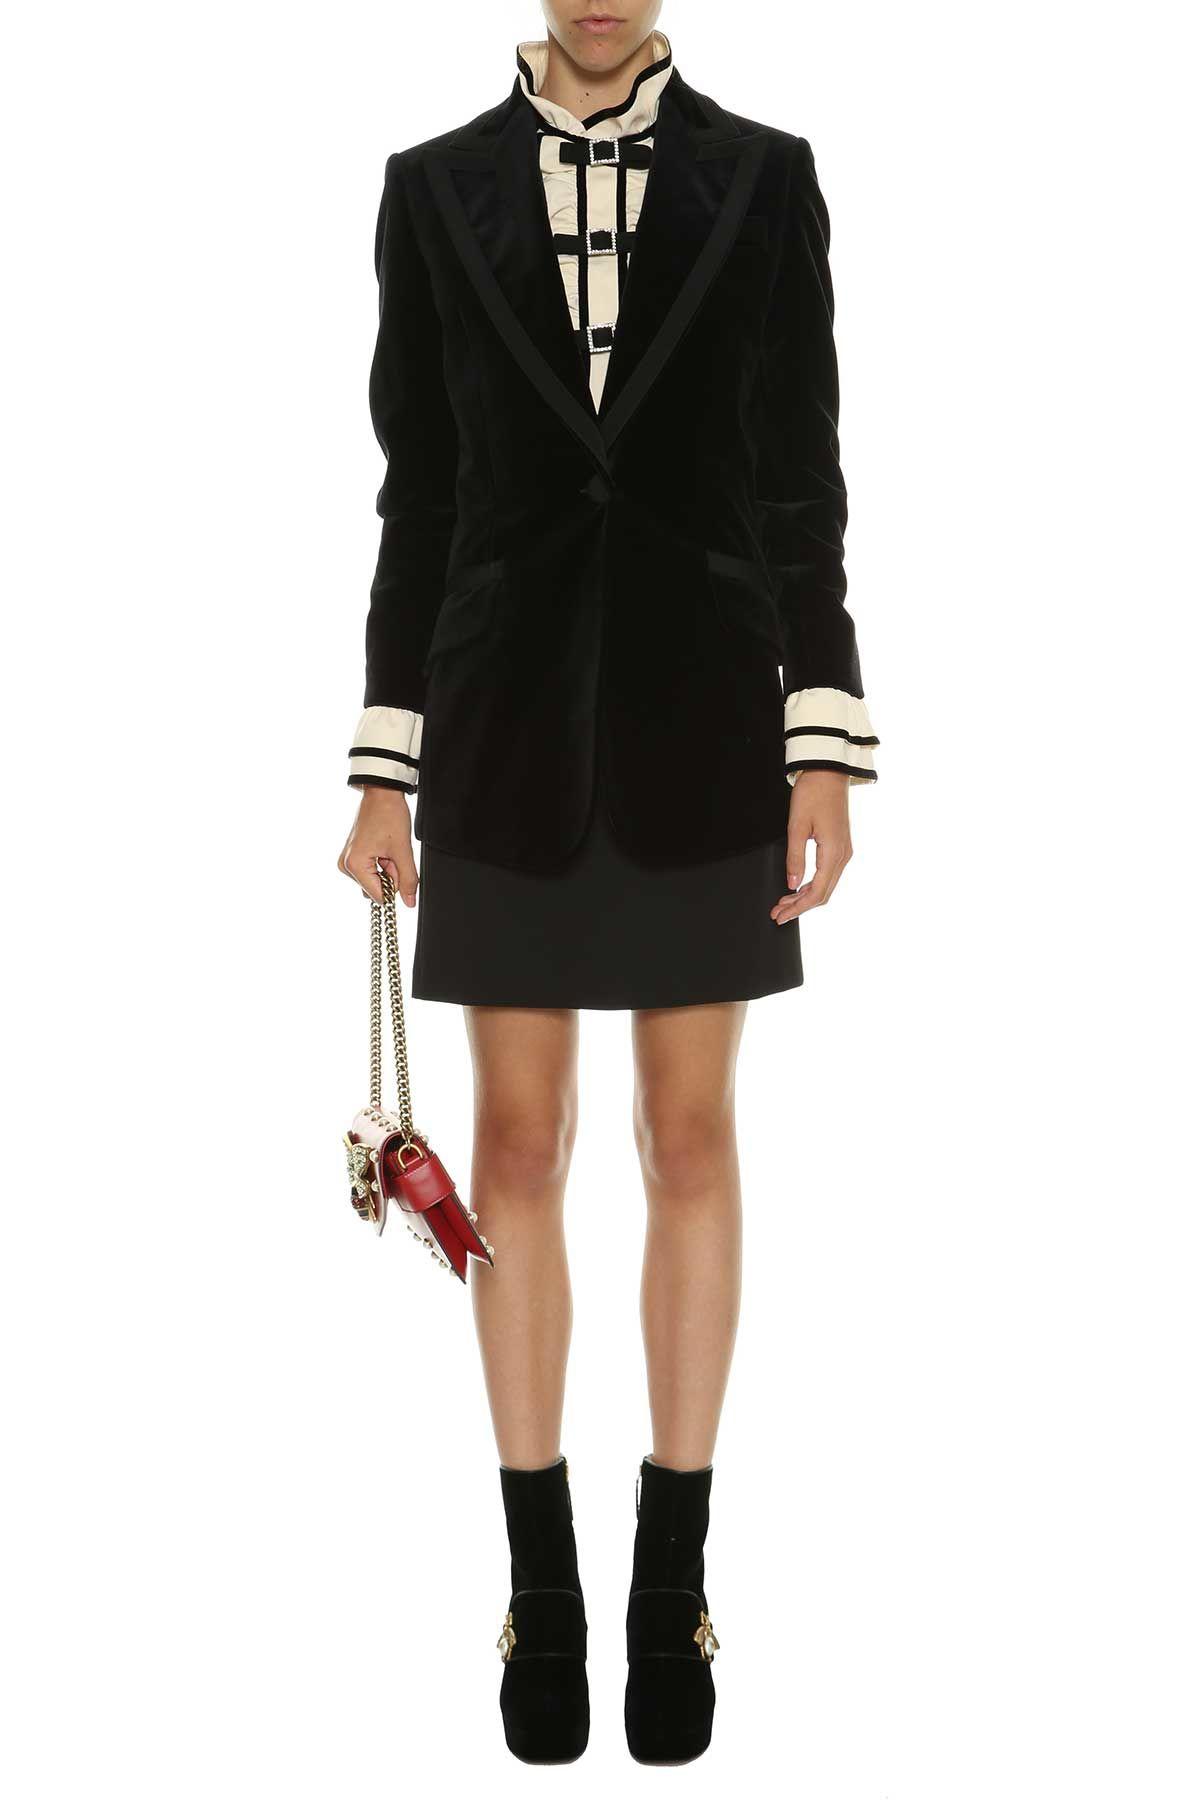 Gucci Velvet Embroidered Jacket